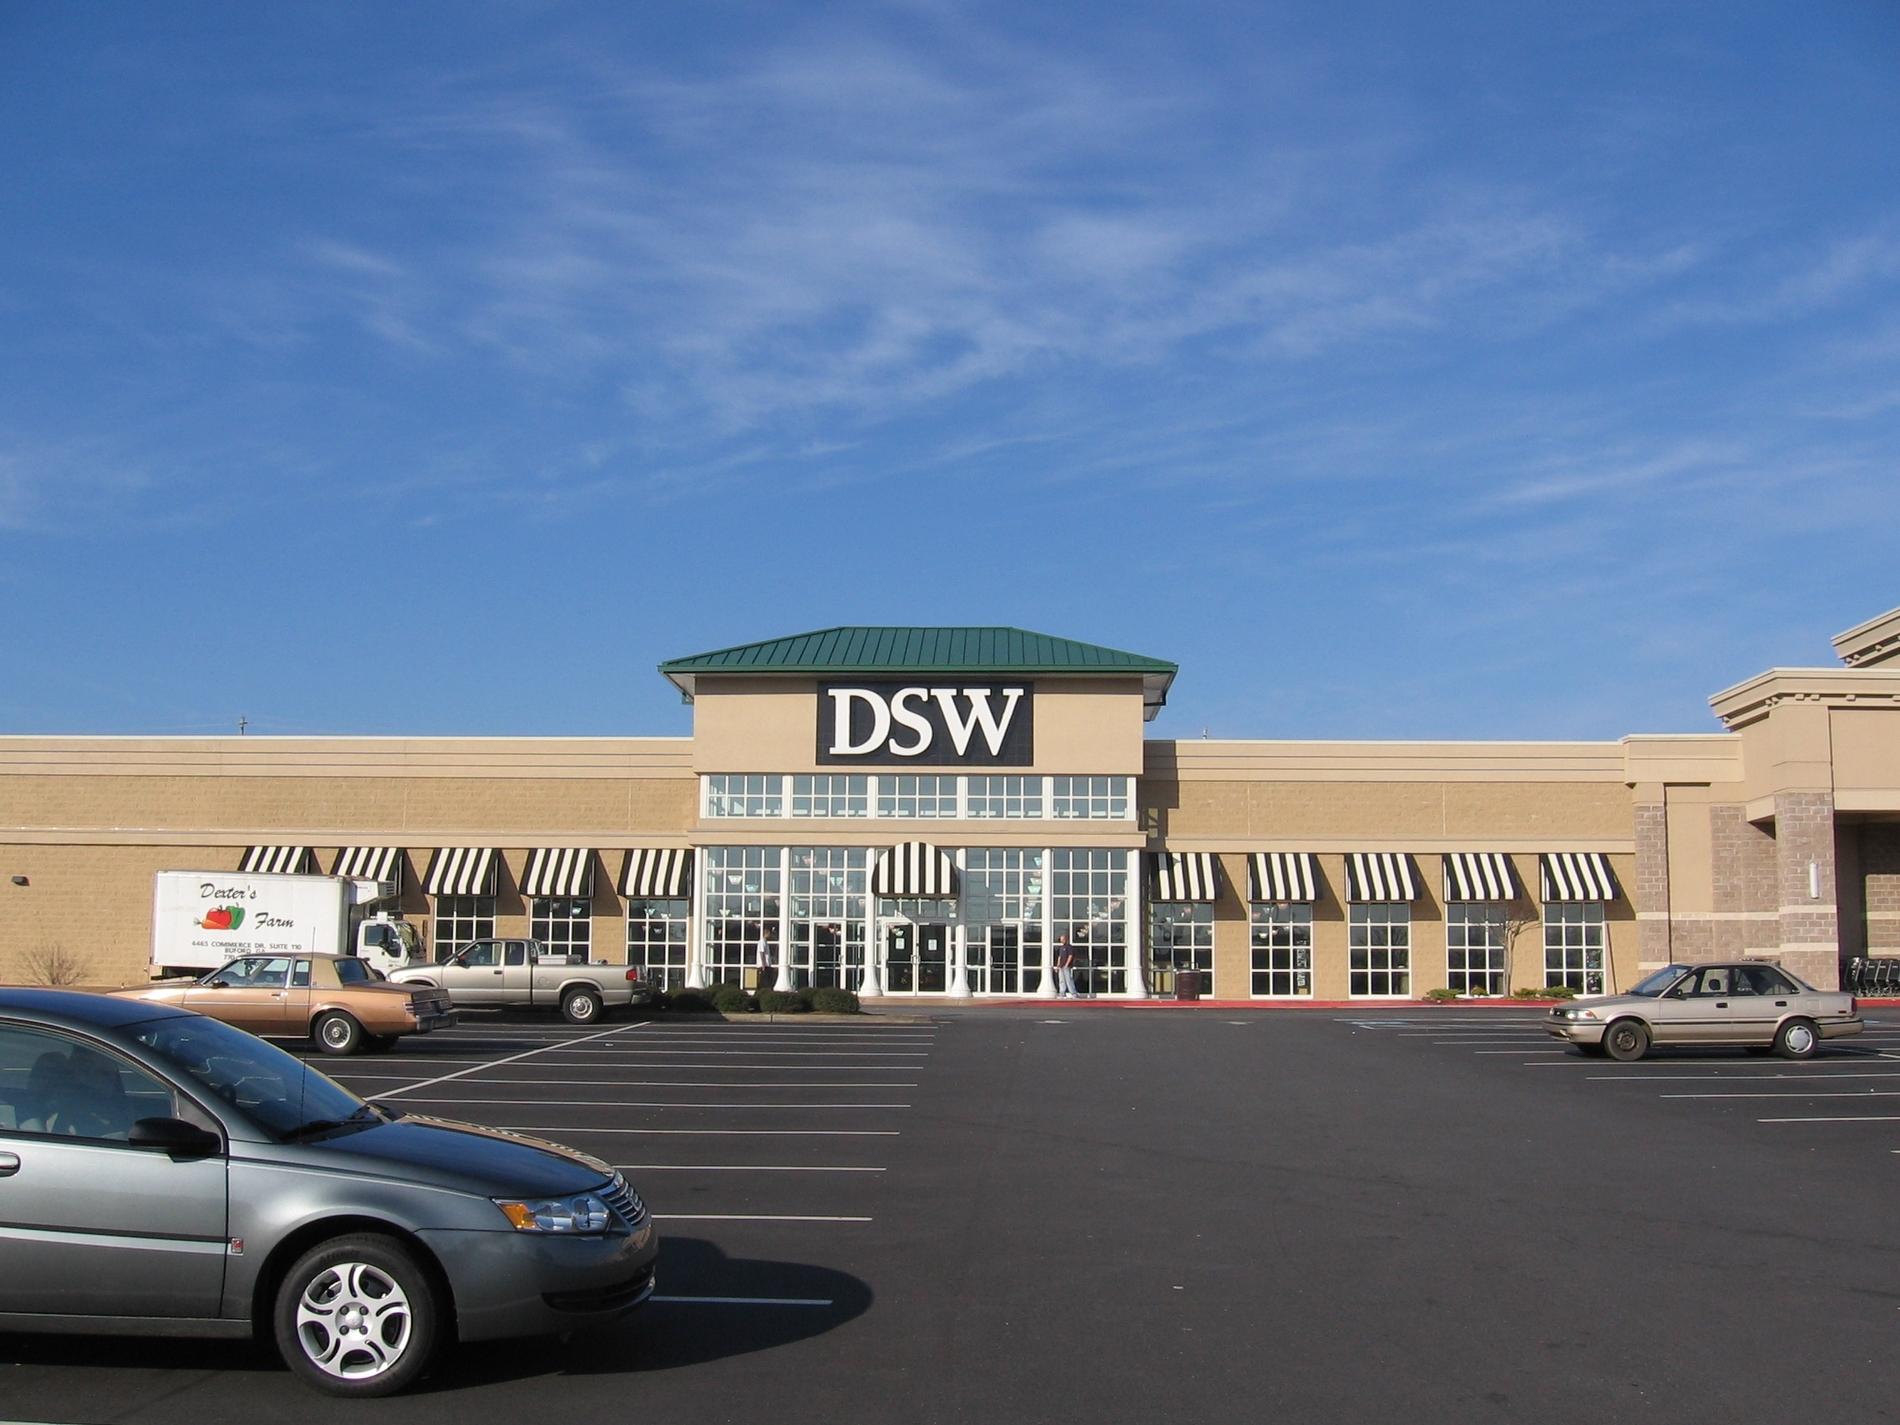 Dsw Women S And Men S Shoe Store In Kennesaw Ga